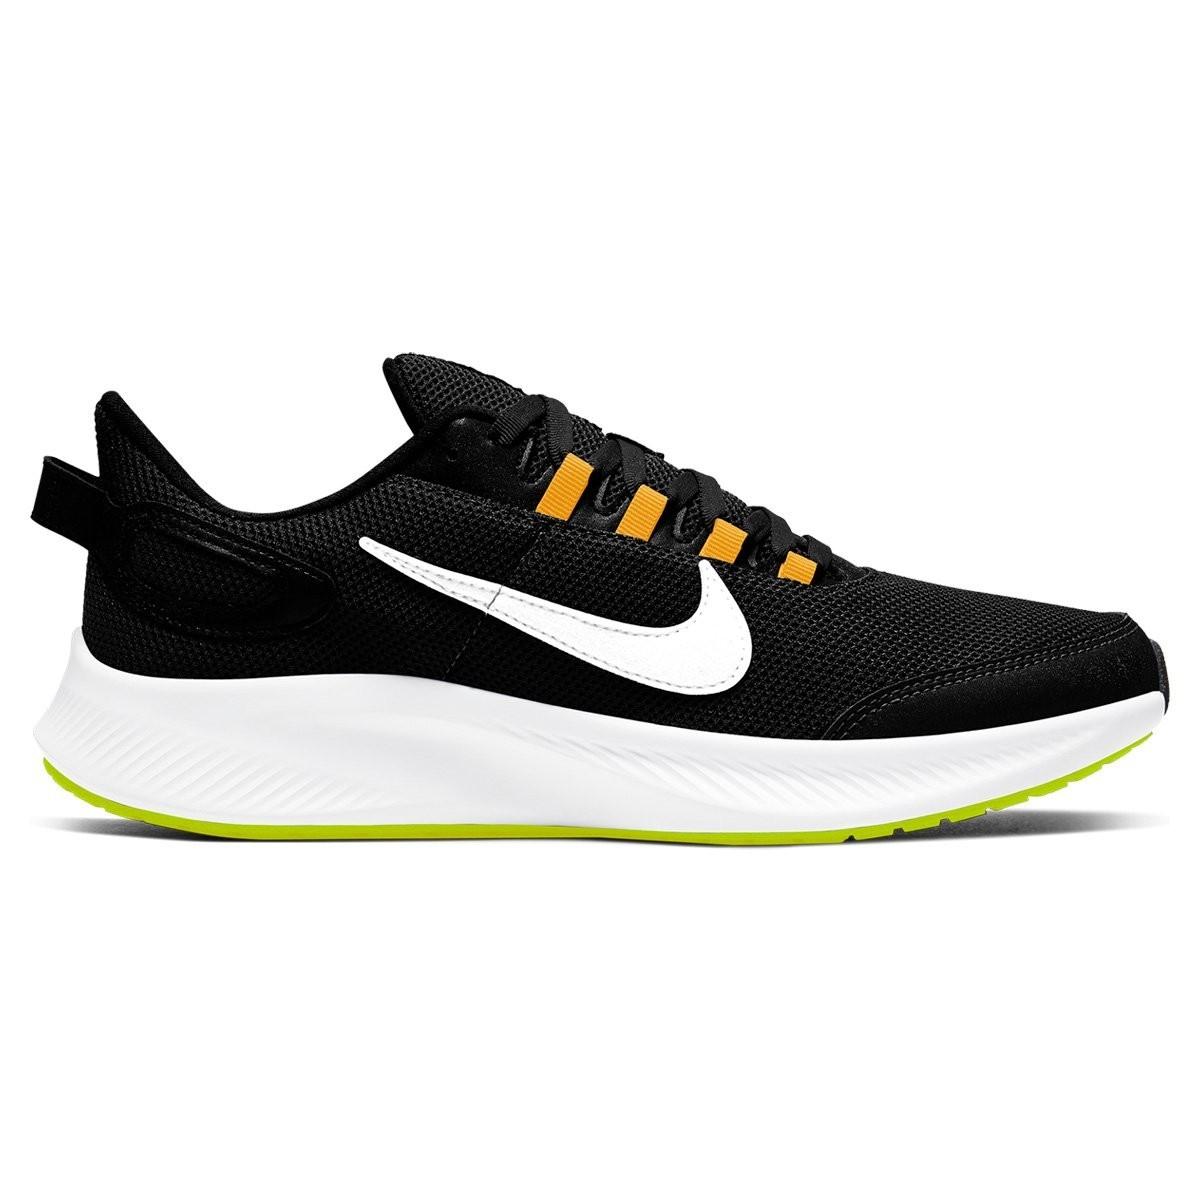 Tênis Nike Runallday 2 Masculino Adulto Corrida